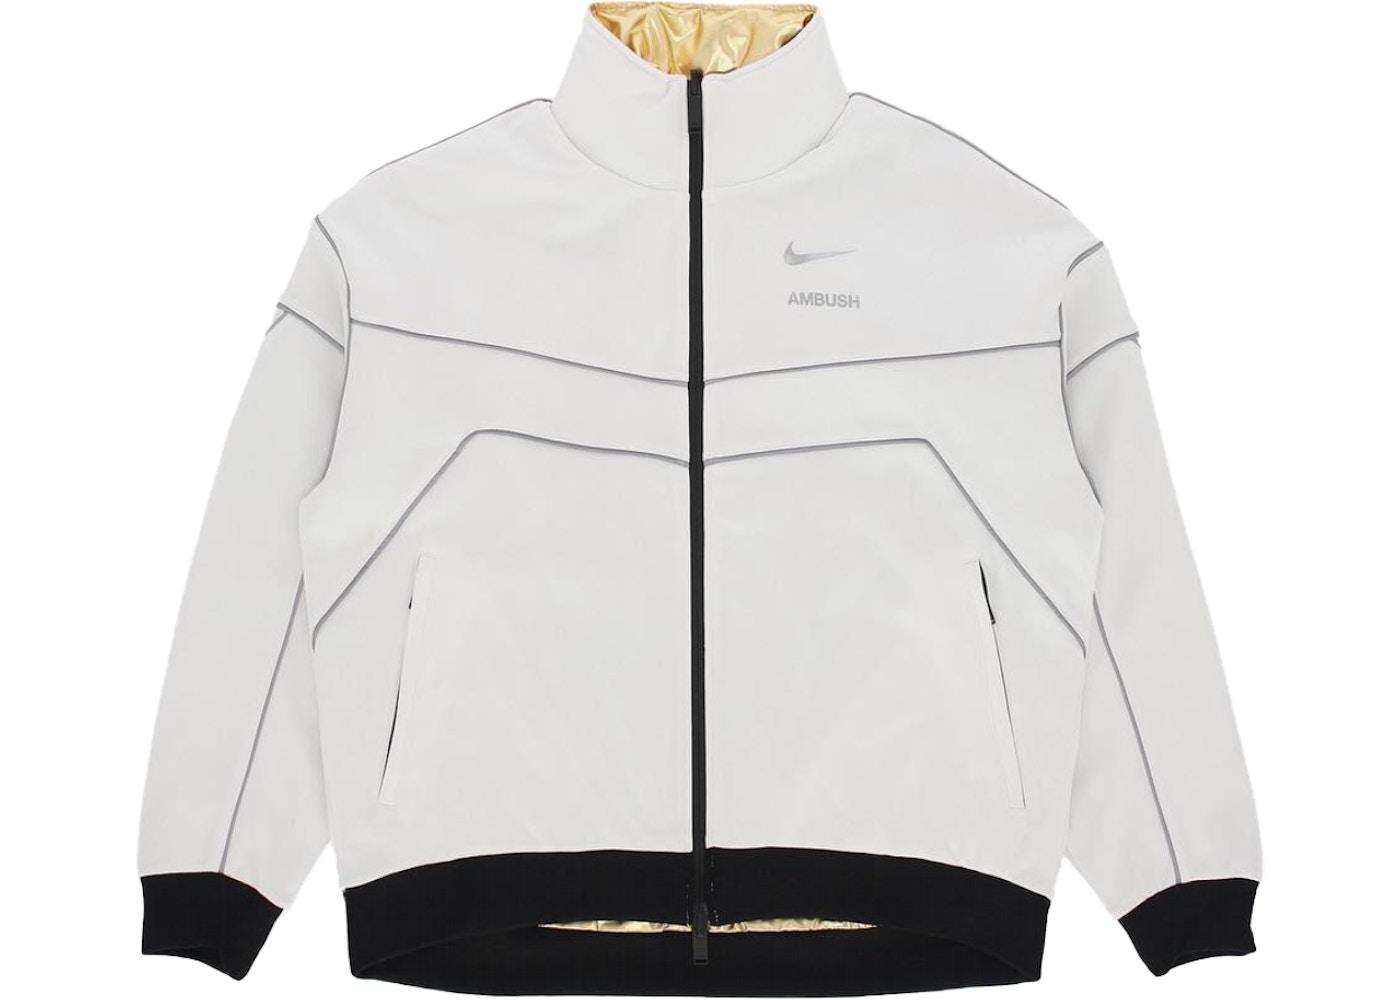 servidor exhaustivo Resonar  Nike x Ambush Women's Reversible Jacket Phantom - FW18